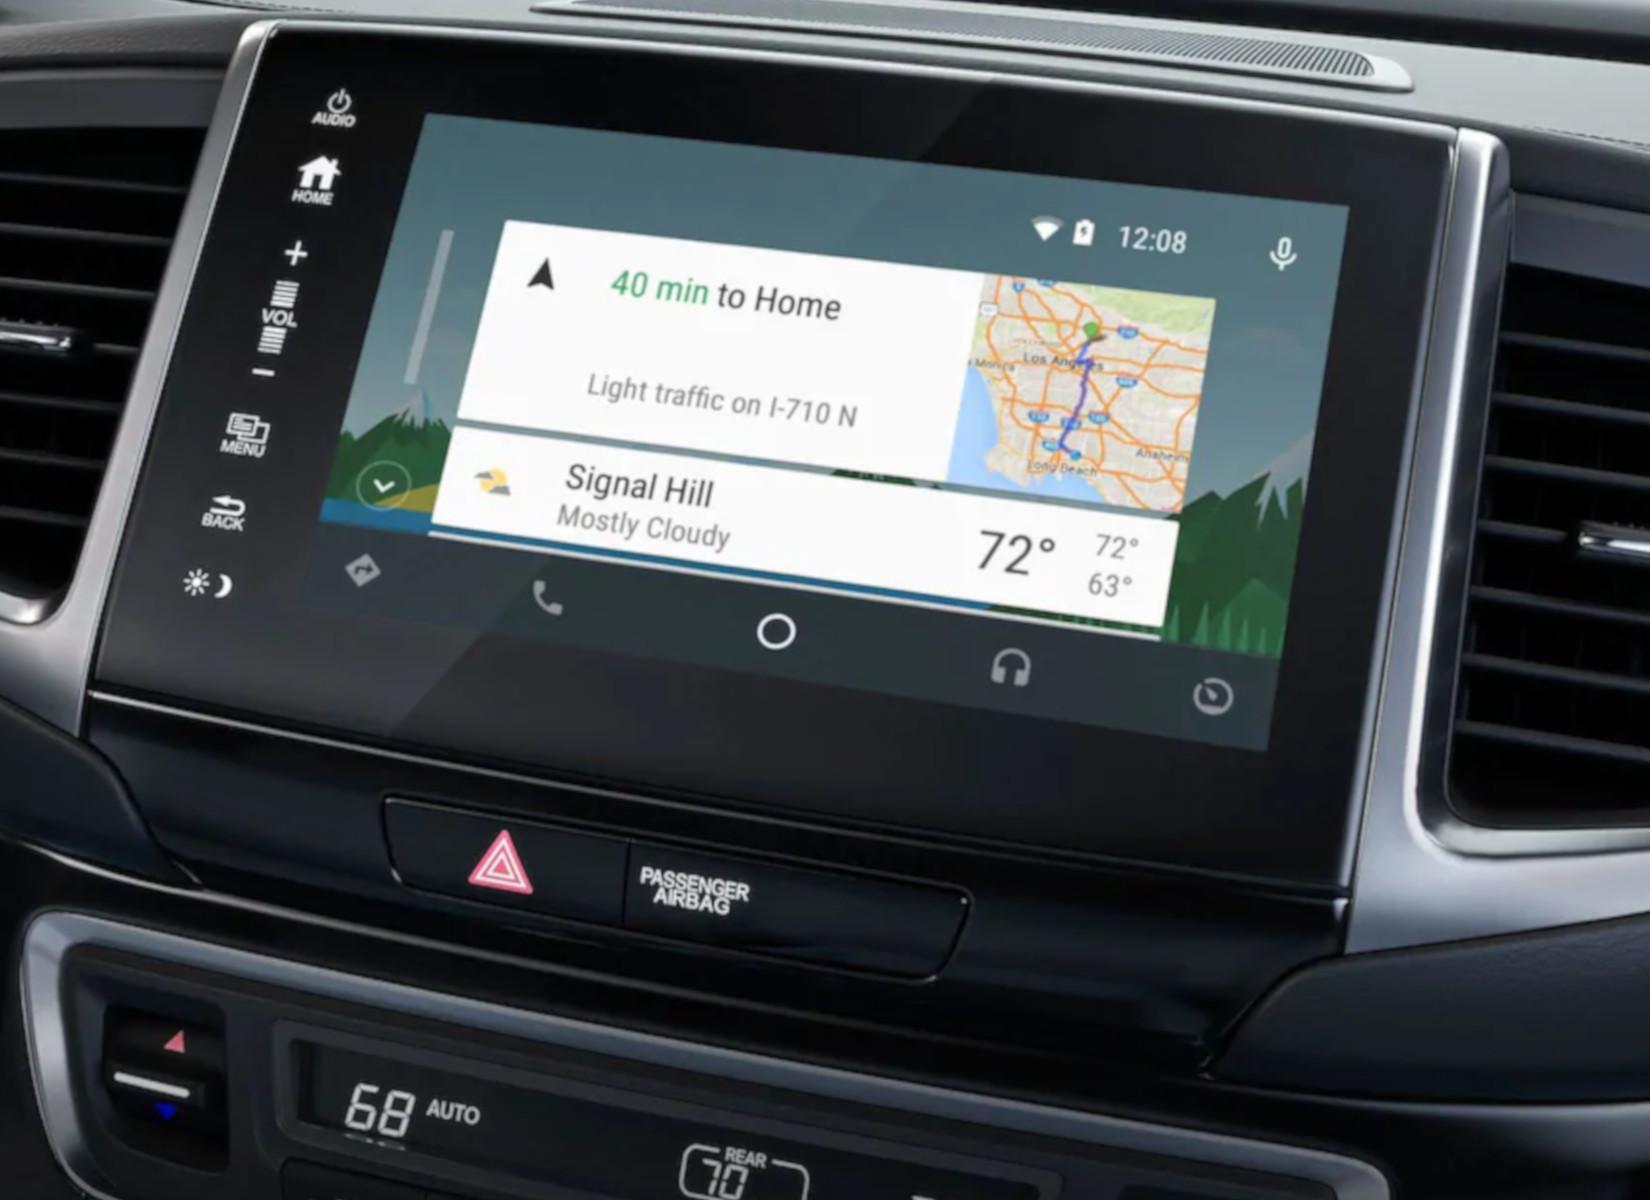 Touchscreen display inside the 2019 Honda Ridgeline